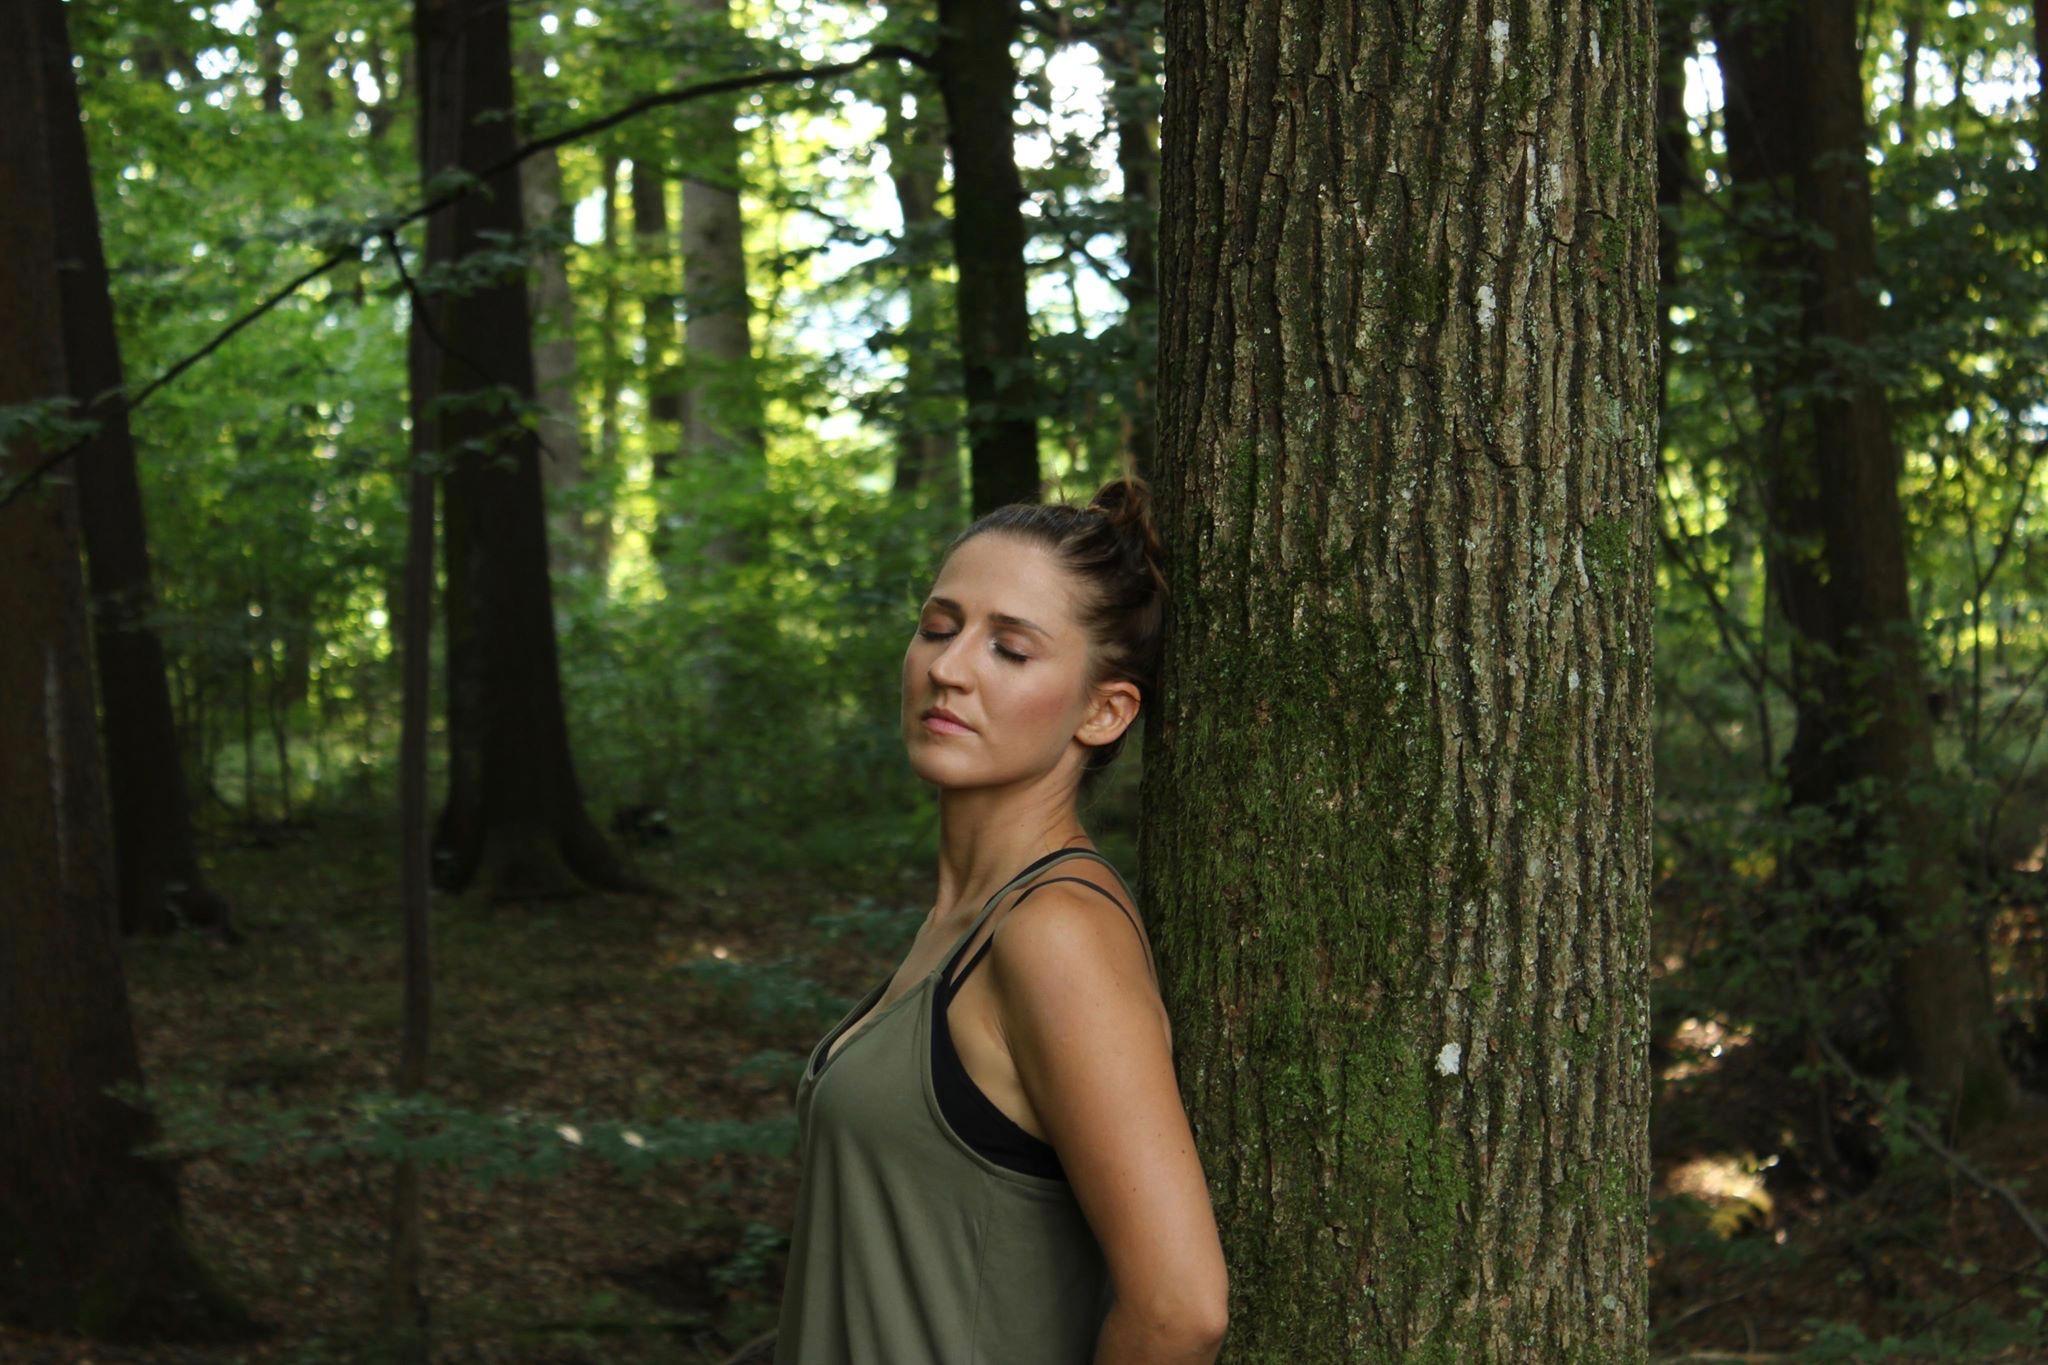 Waldbaden zeitfinden.yoga